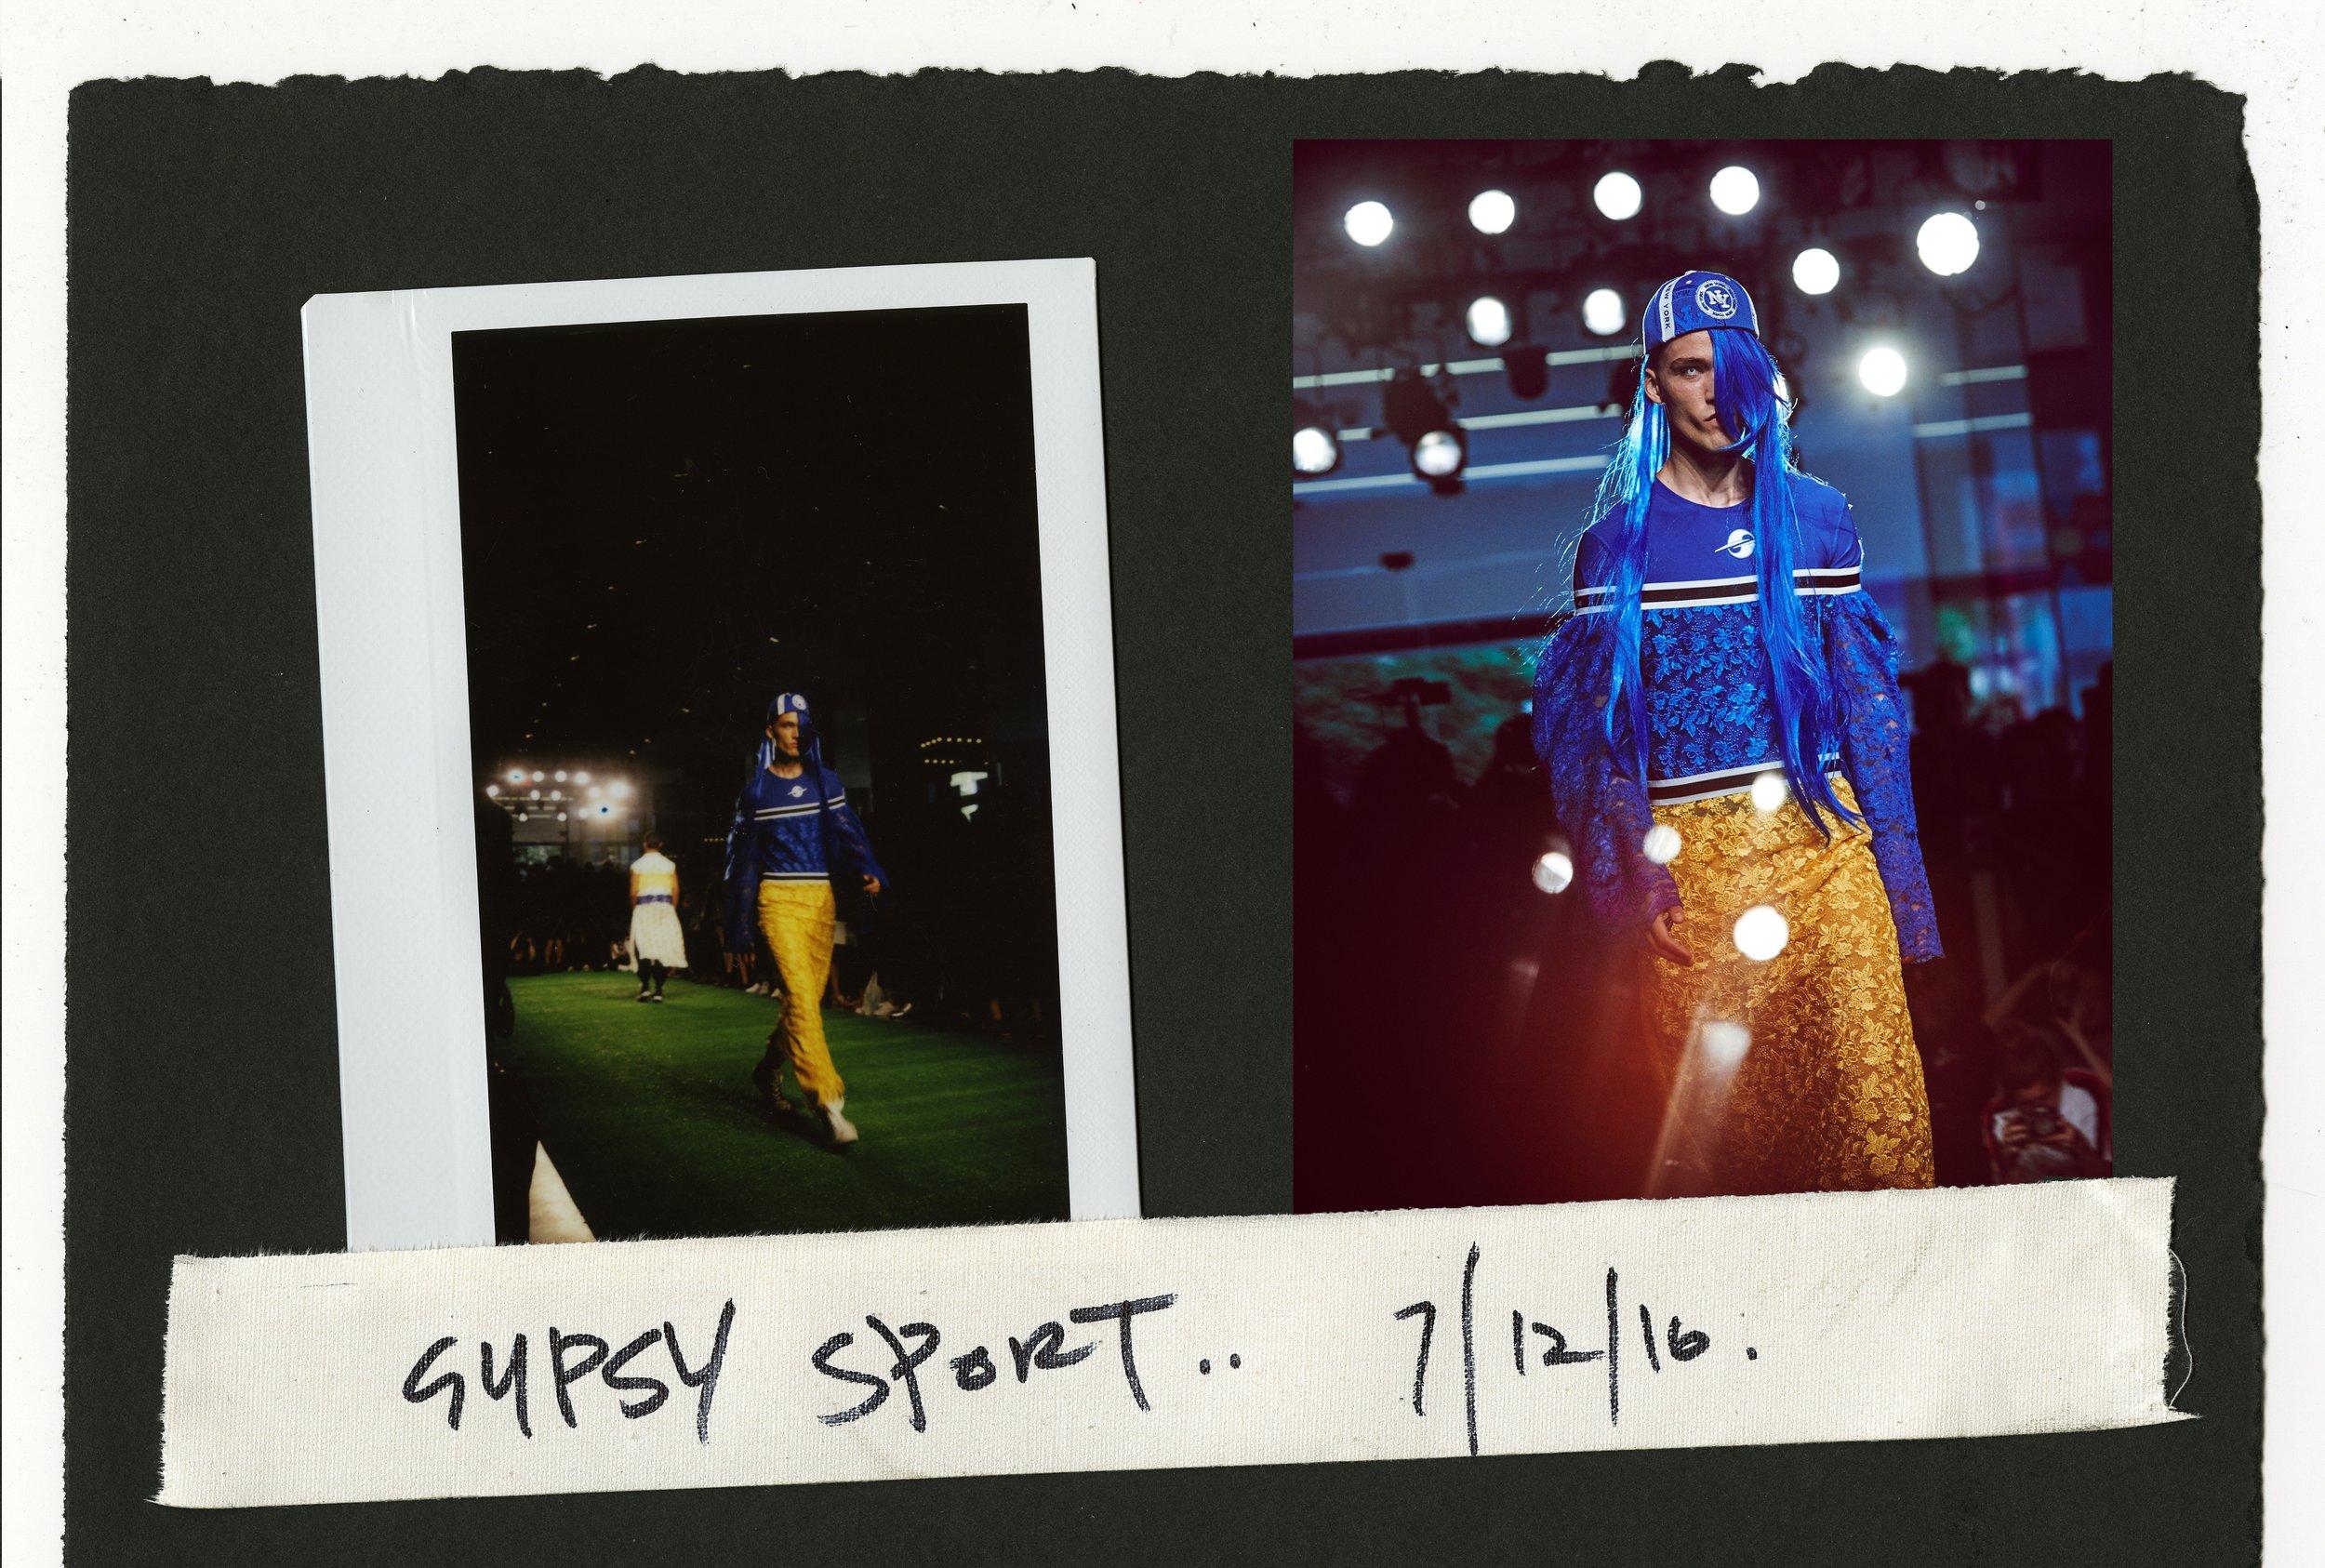 Boyle_GypsySport_montage02.jpg